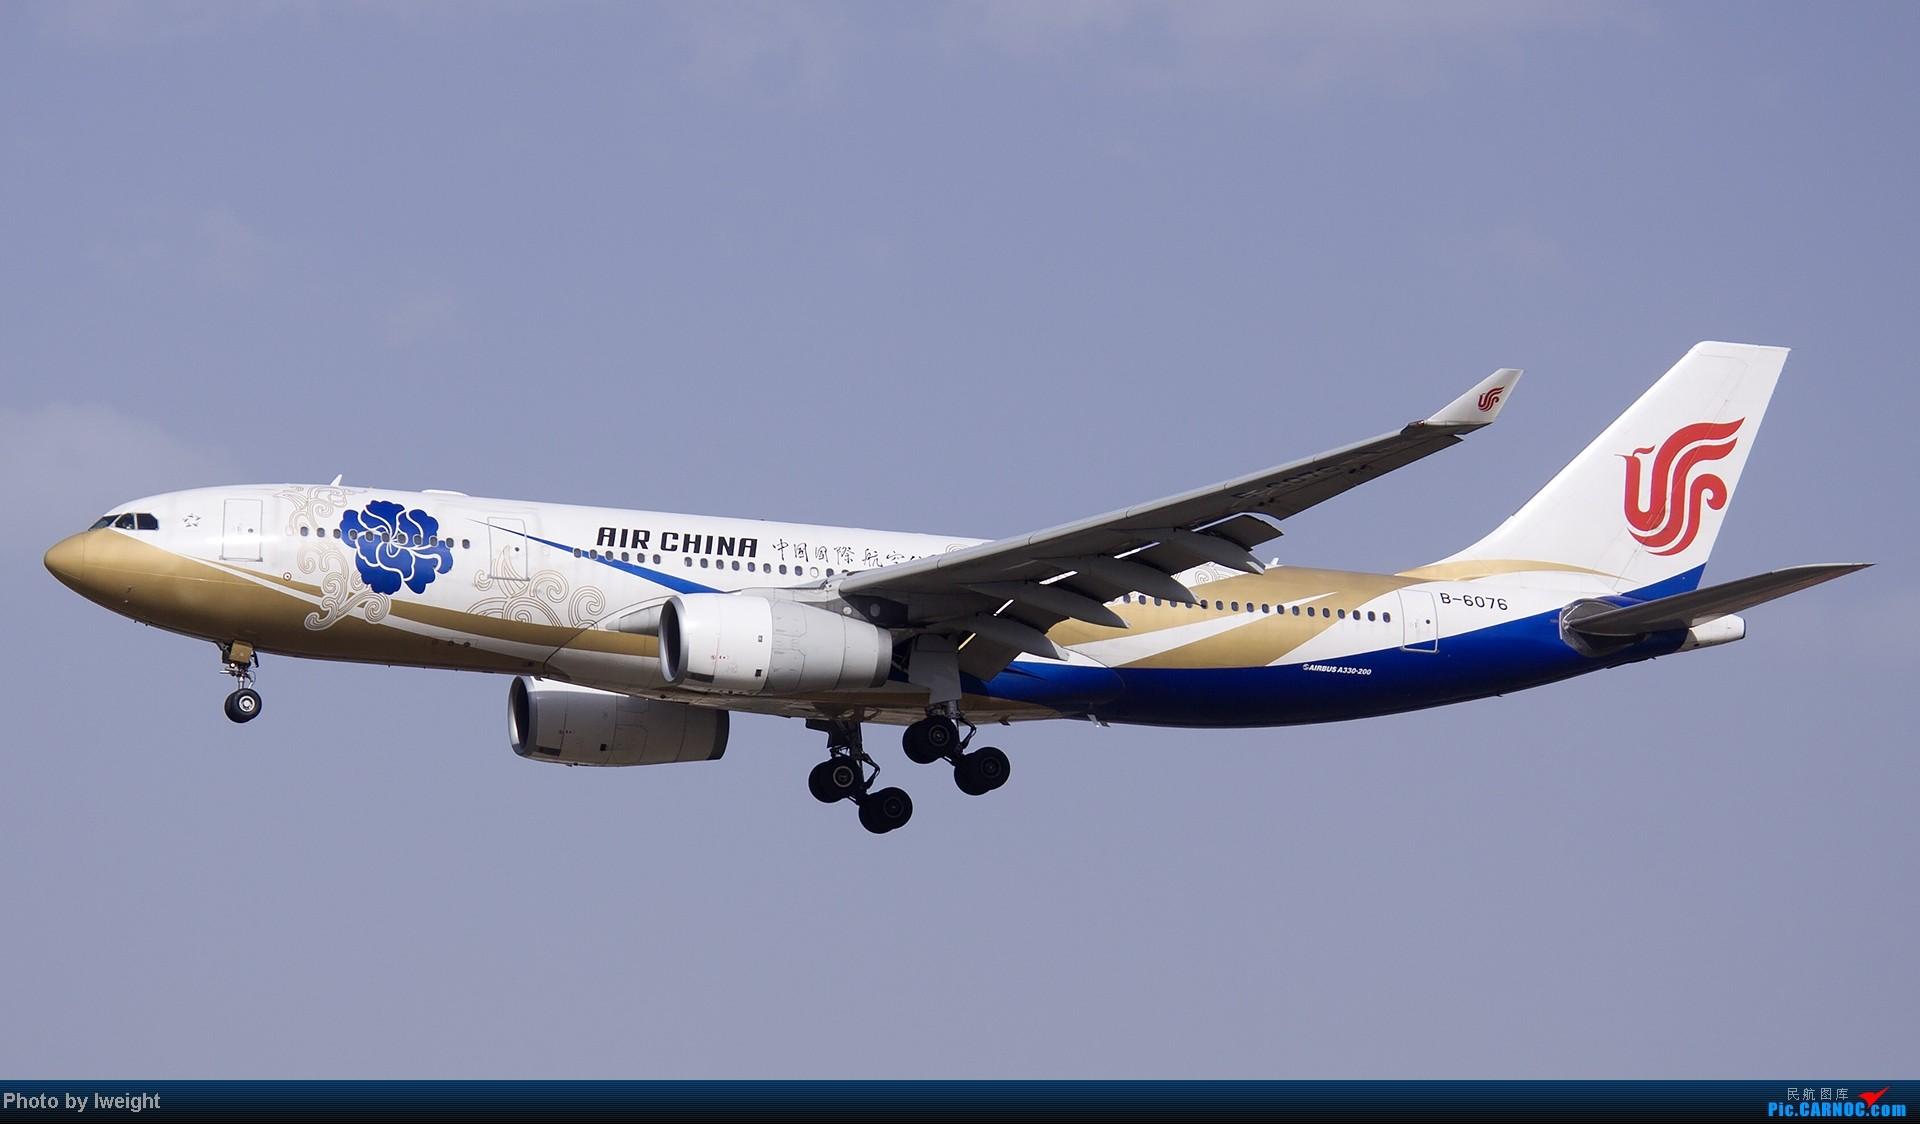 Re:[原创]5月3日首都机场风云变幻的下午 AIRBUS A330-200 B-6076 中国北京首都机场